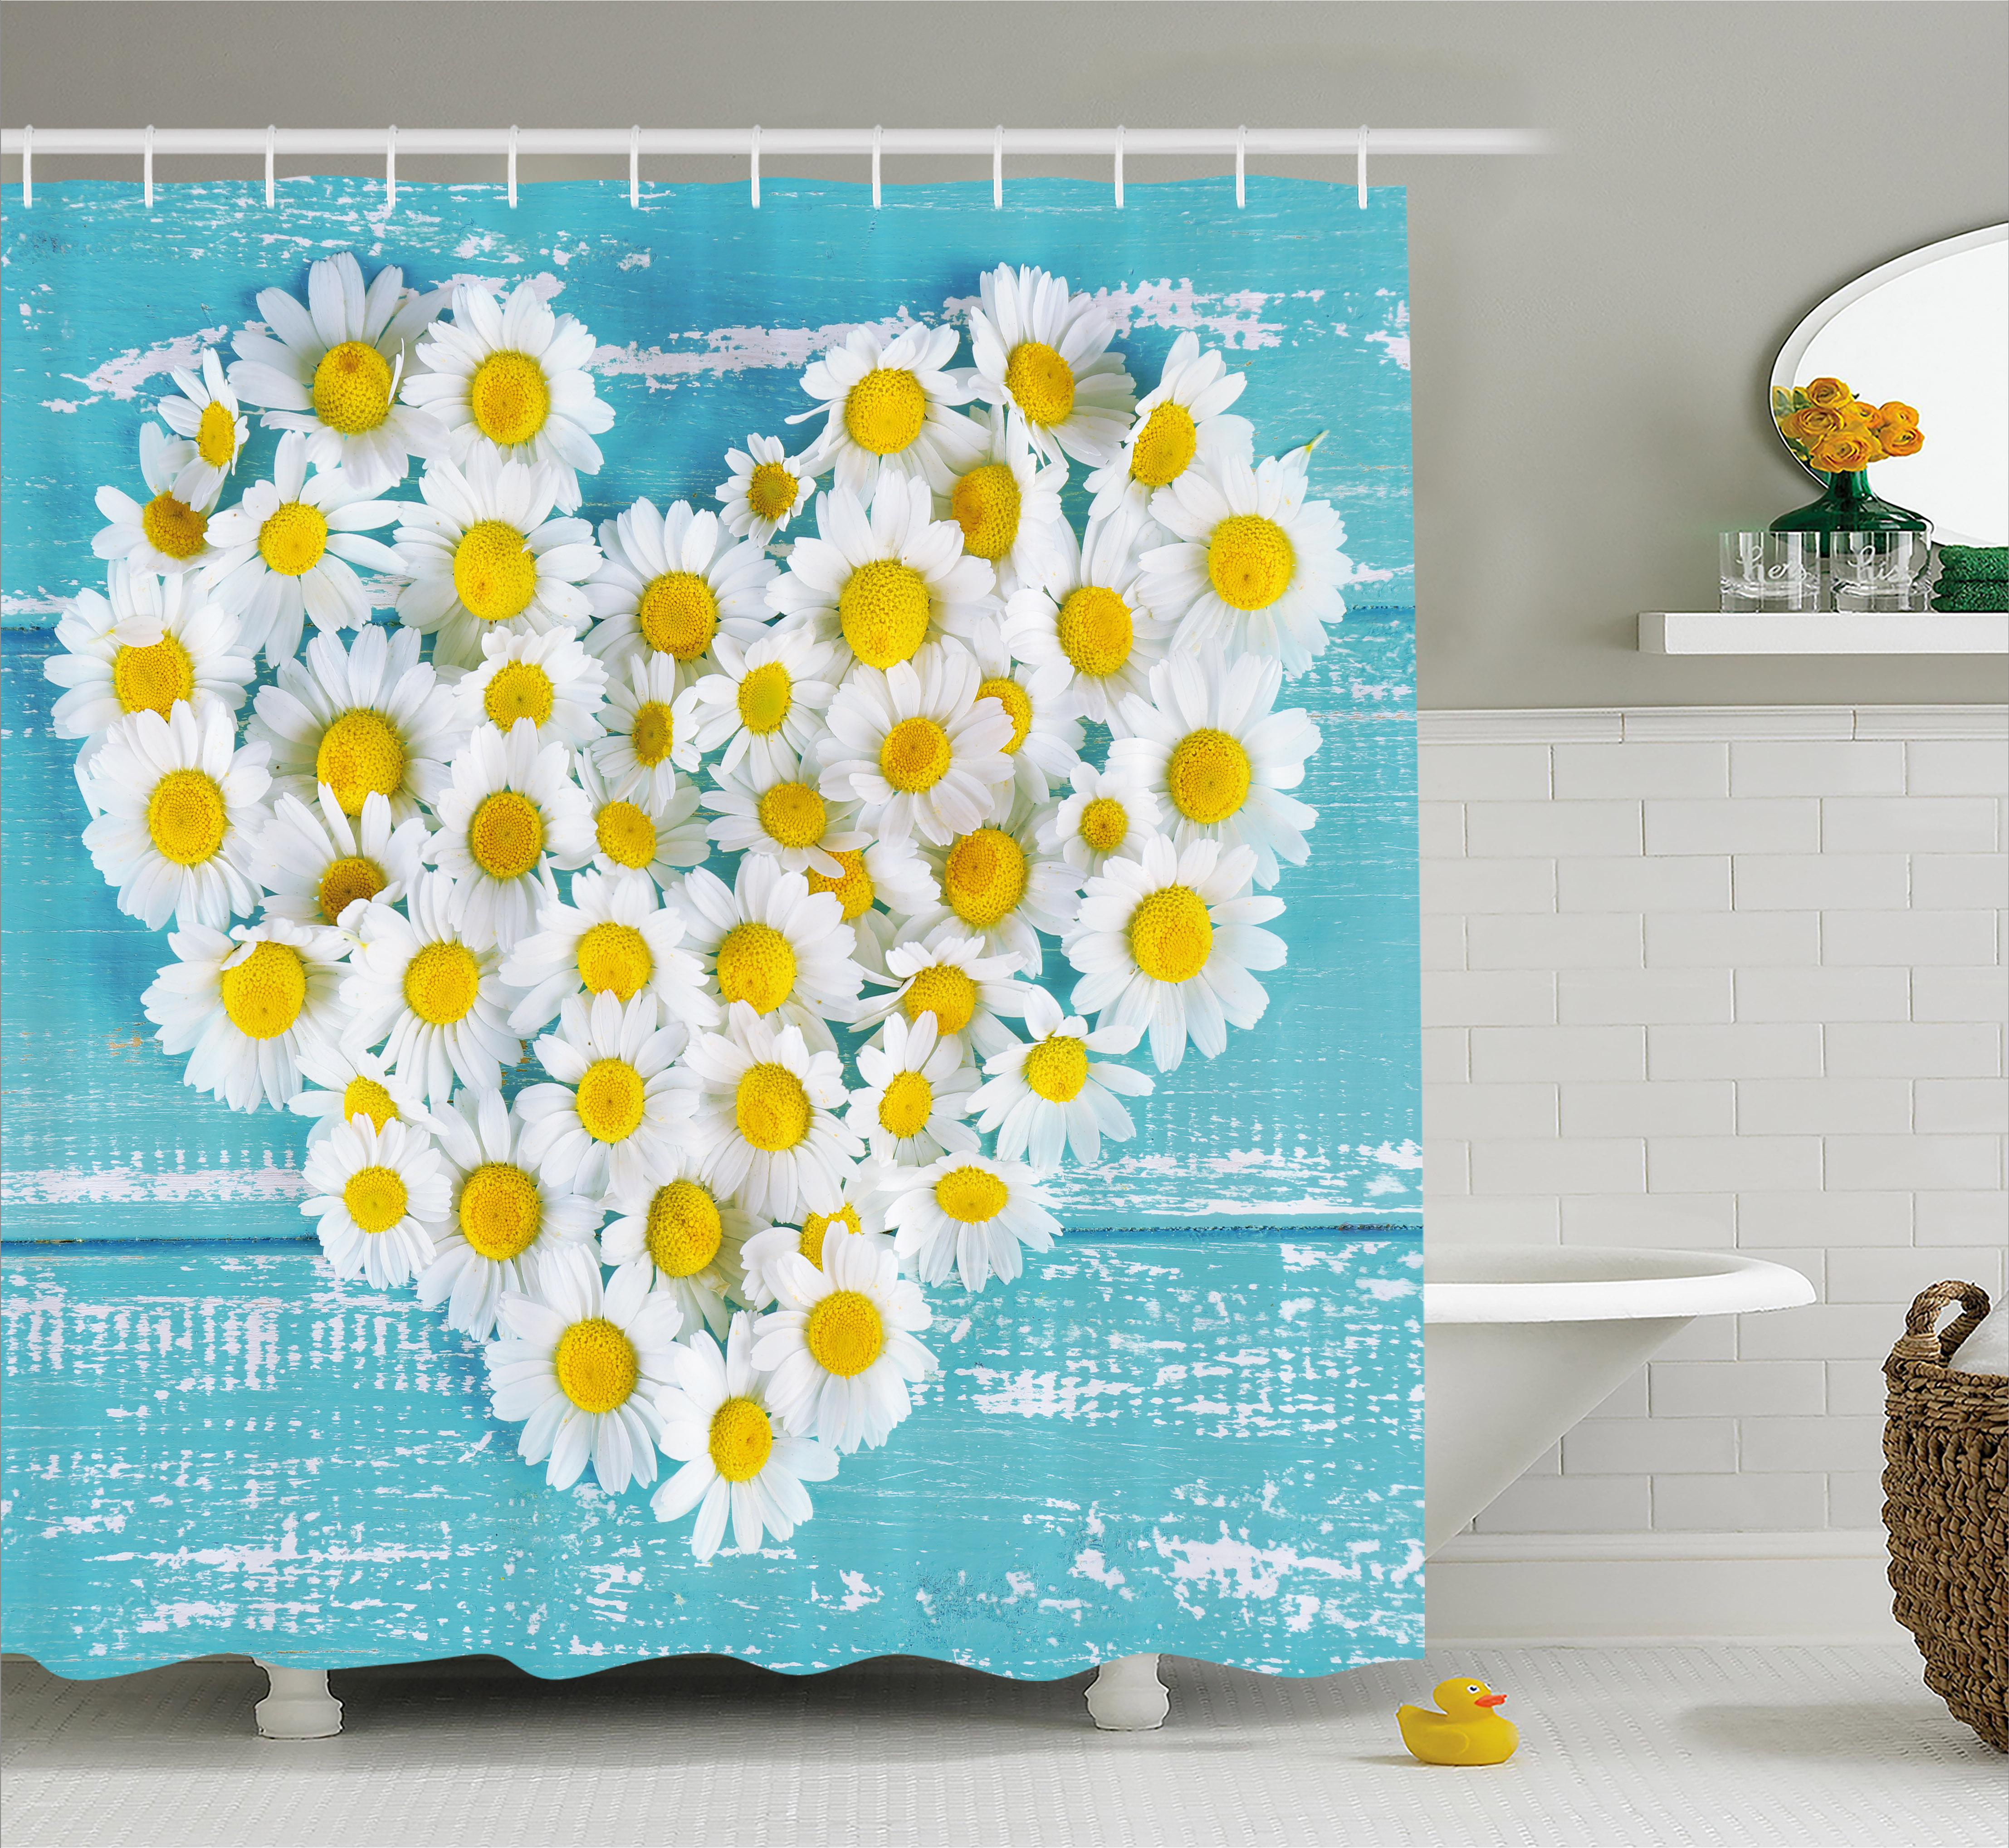 Shower Curtain, Heart Shaped Daisy Flowers